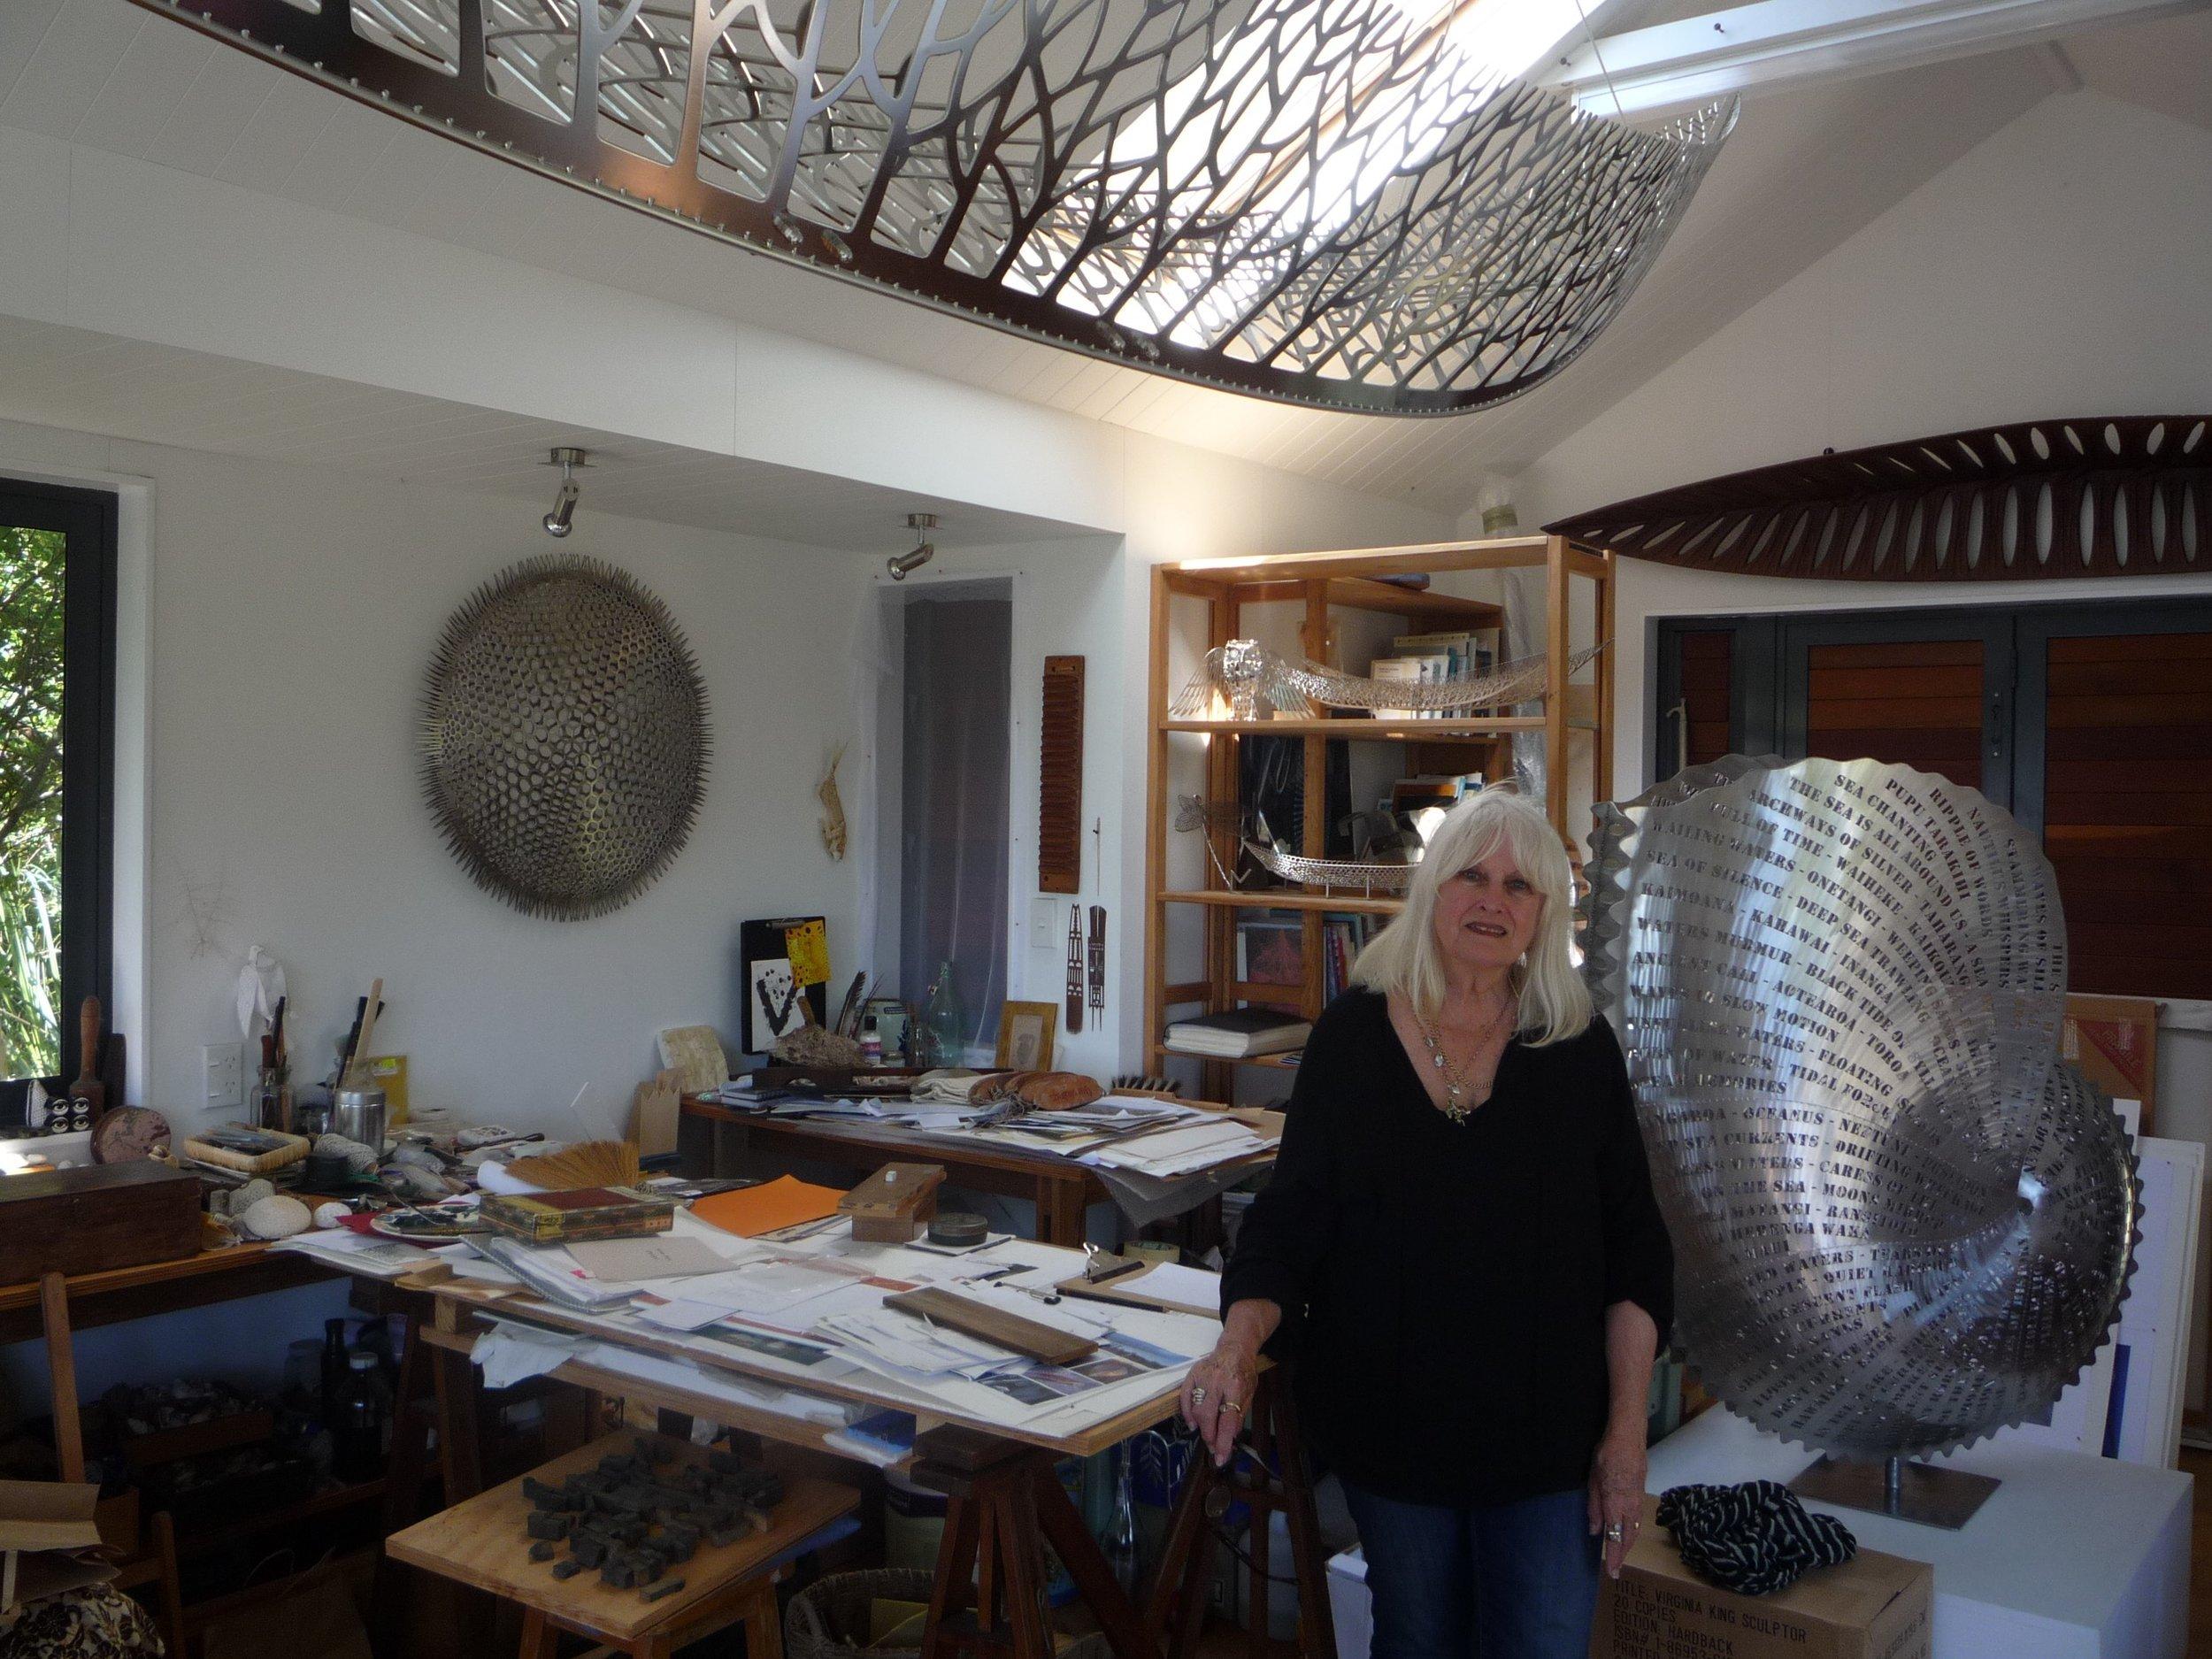 Virginia King in her Waiheke Island Studio . Image courtesy of Gulf News.